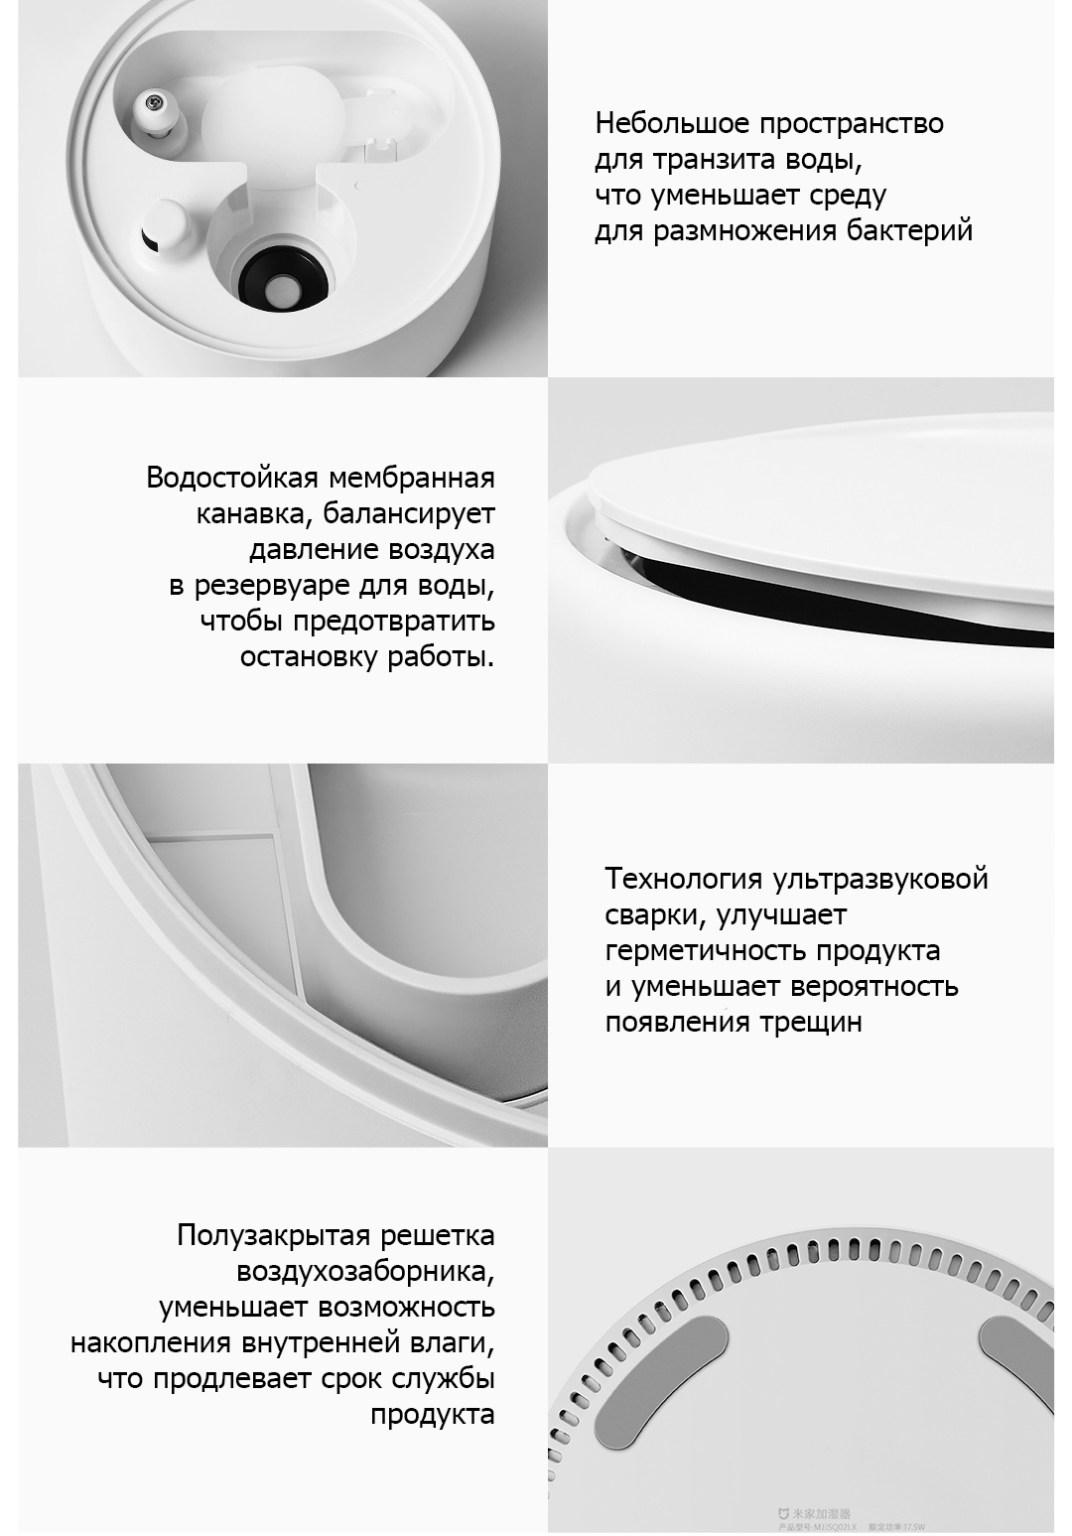 Увлажнитель воздуха Xiaomi Mijia Mi Air Humidifier (4л) (MJJSQ02LX)